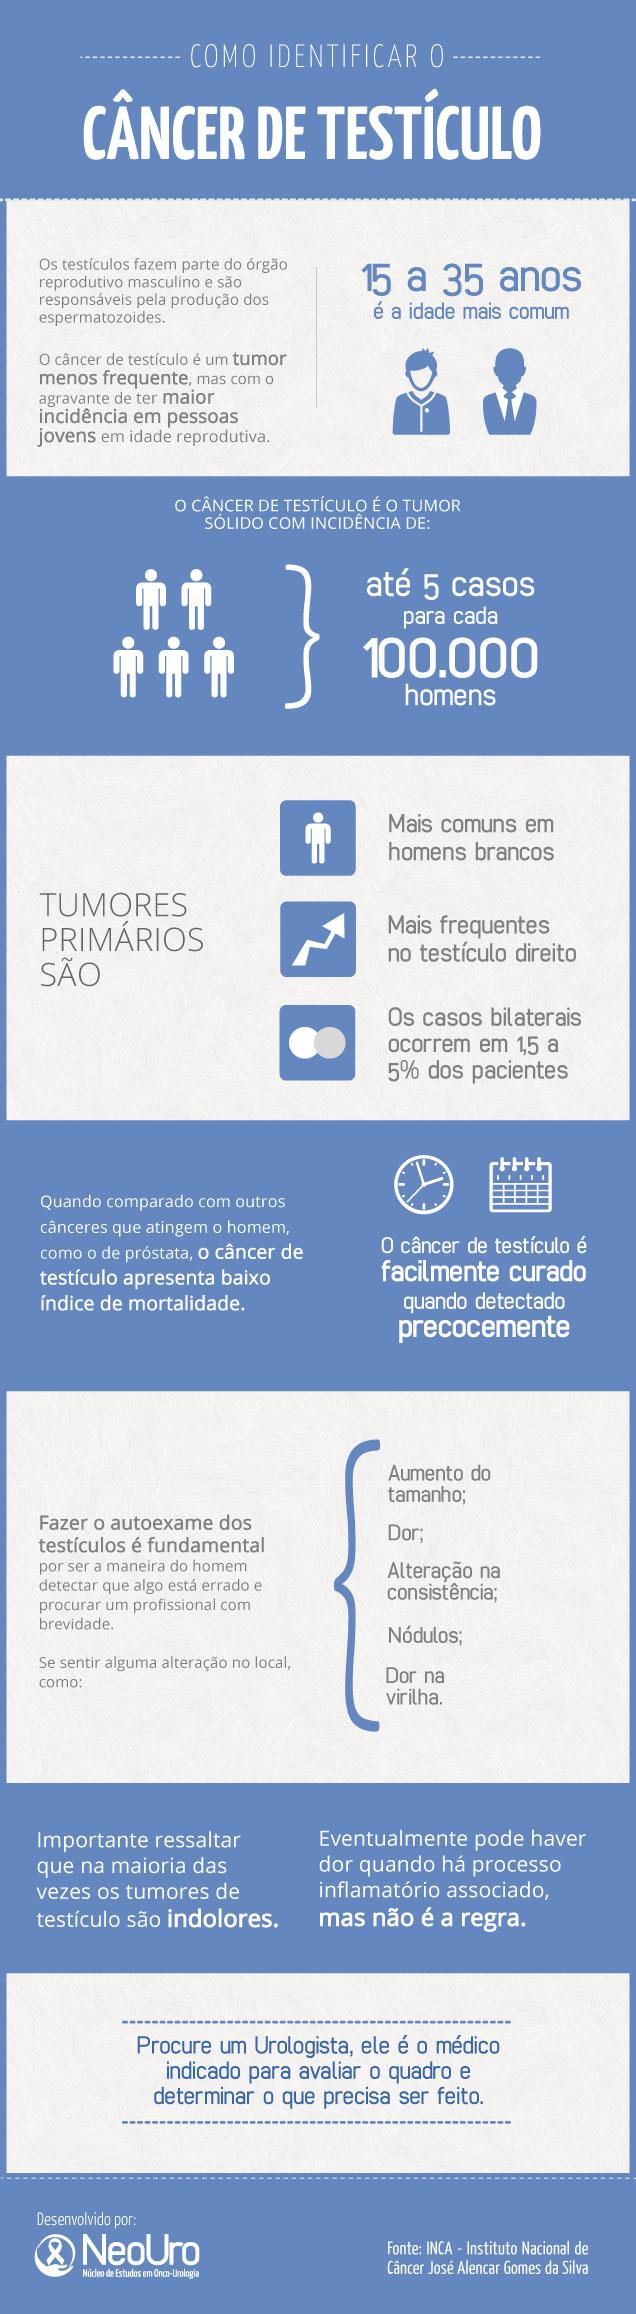 Infográfico-Cancer-de-Testiculo